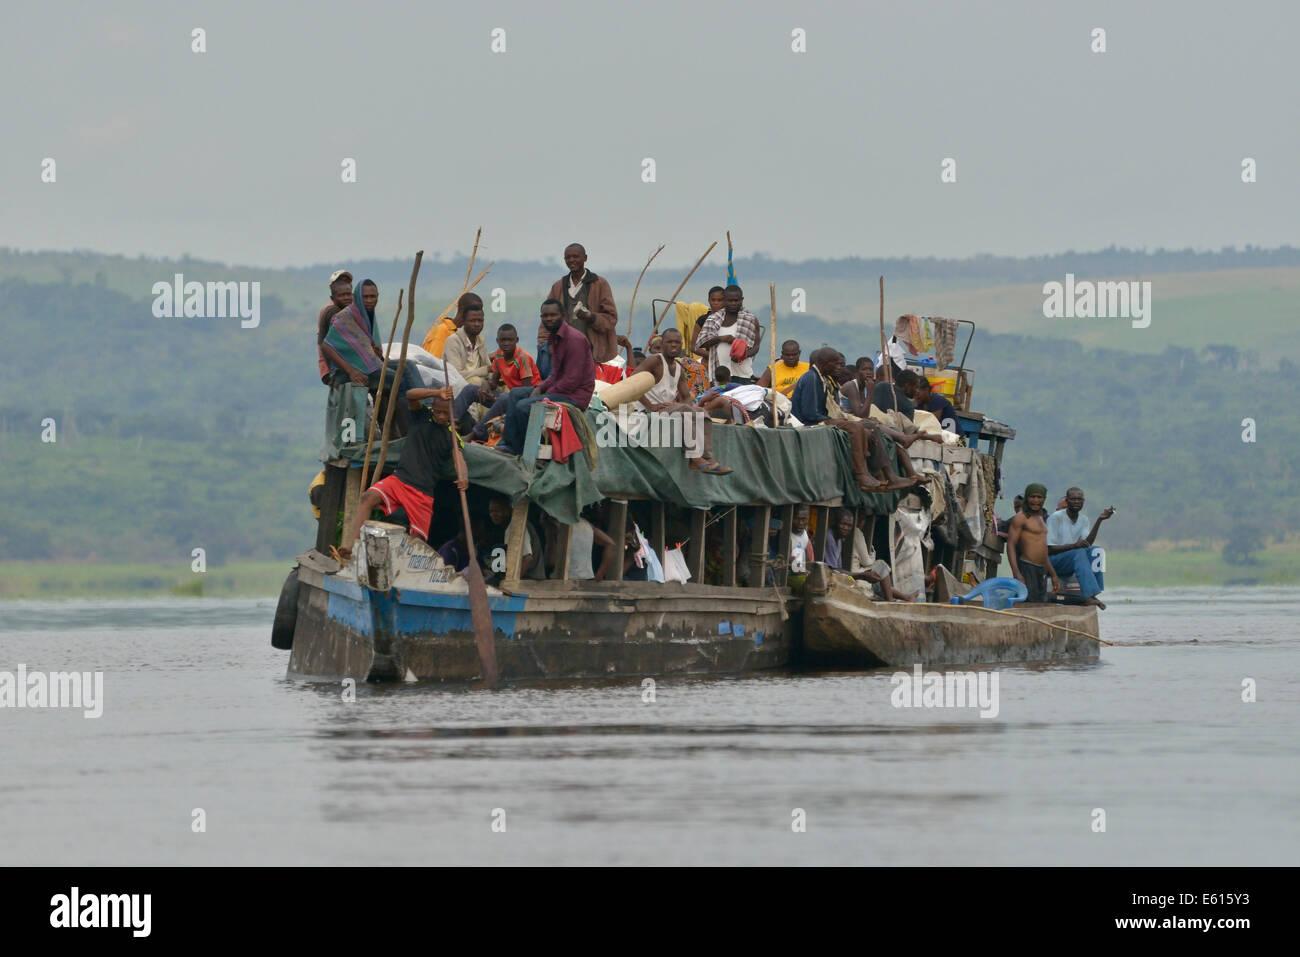 Overloaded boat on the Congo River, near Tshumbiri, Bandundu Province, Democratic Republic of the Congo - Stock Image